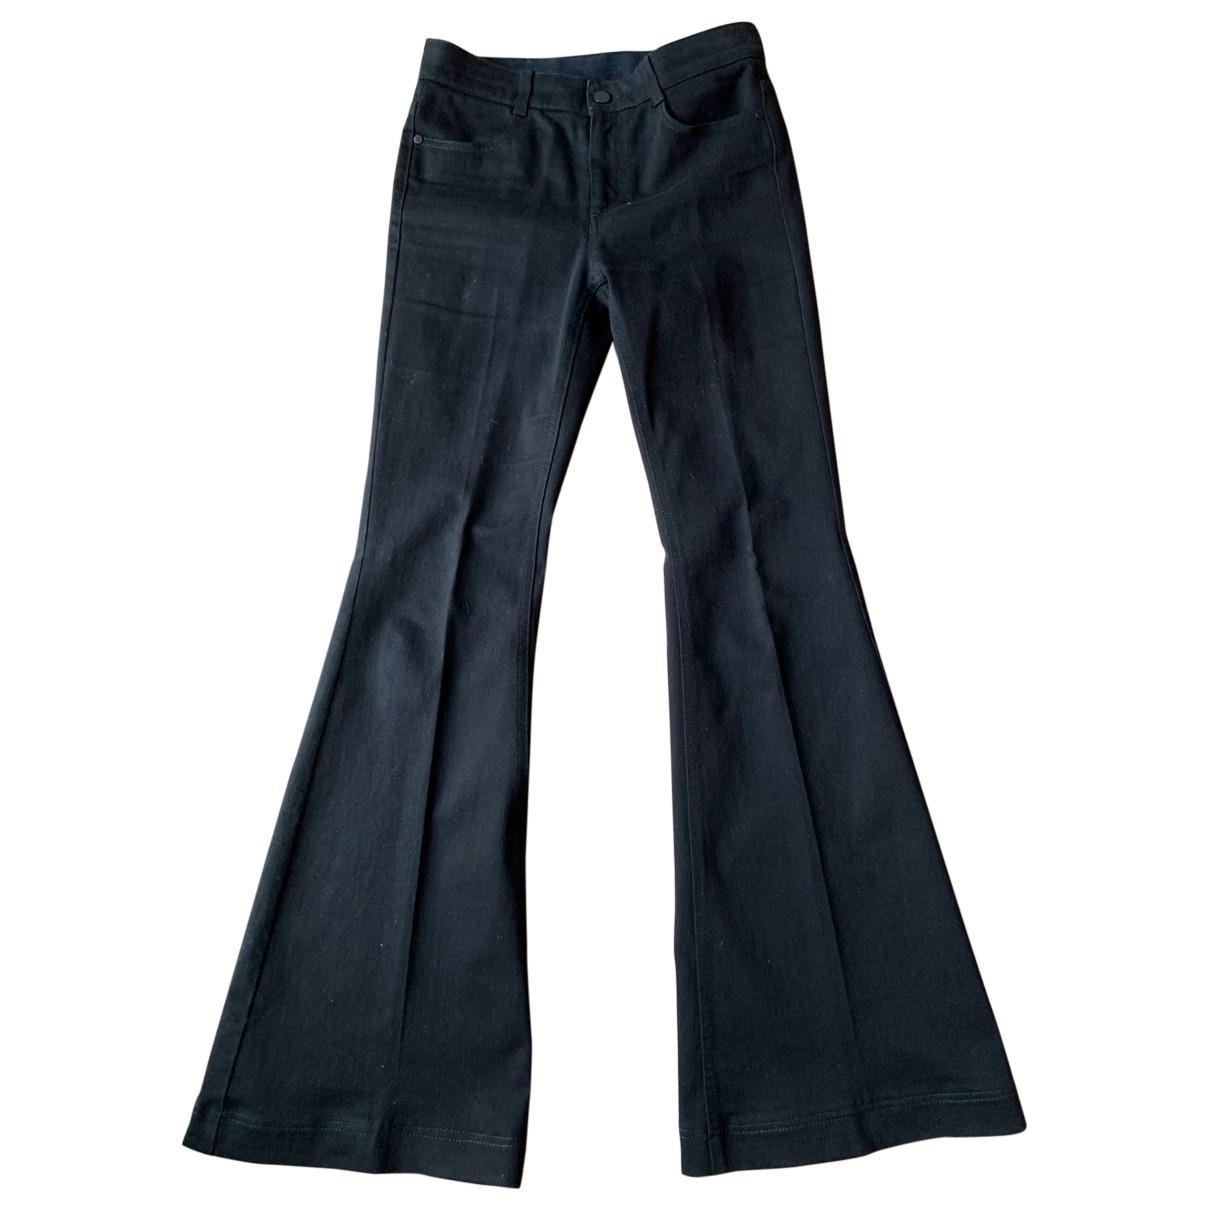 Stella Mccartney \N Black Cotton - elasthane Jeans for Women 28 US